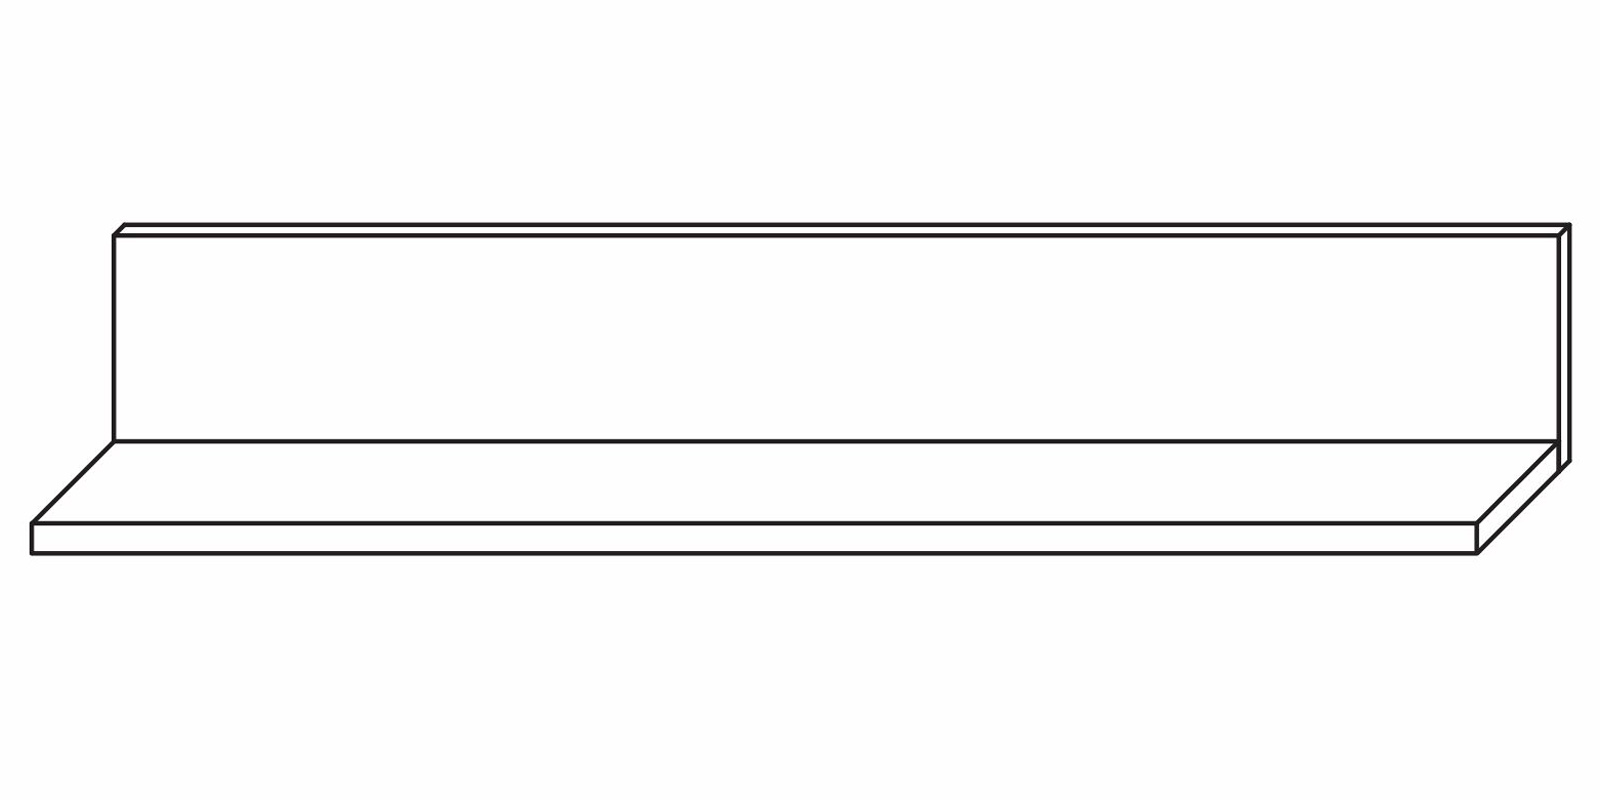 Полка навесная 1050 «Парма Люкс» Кураж